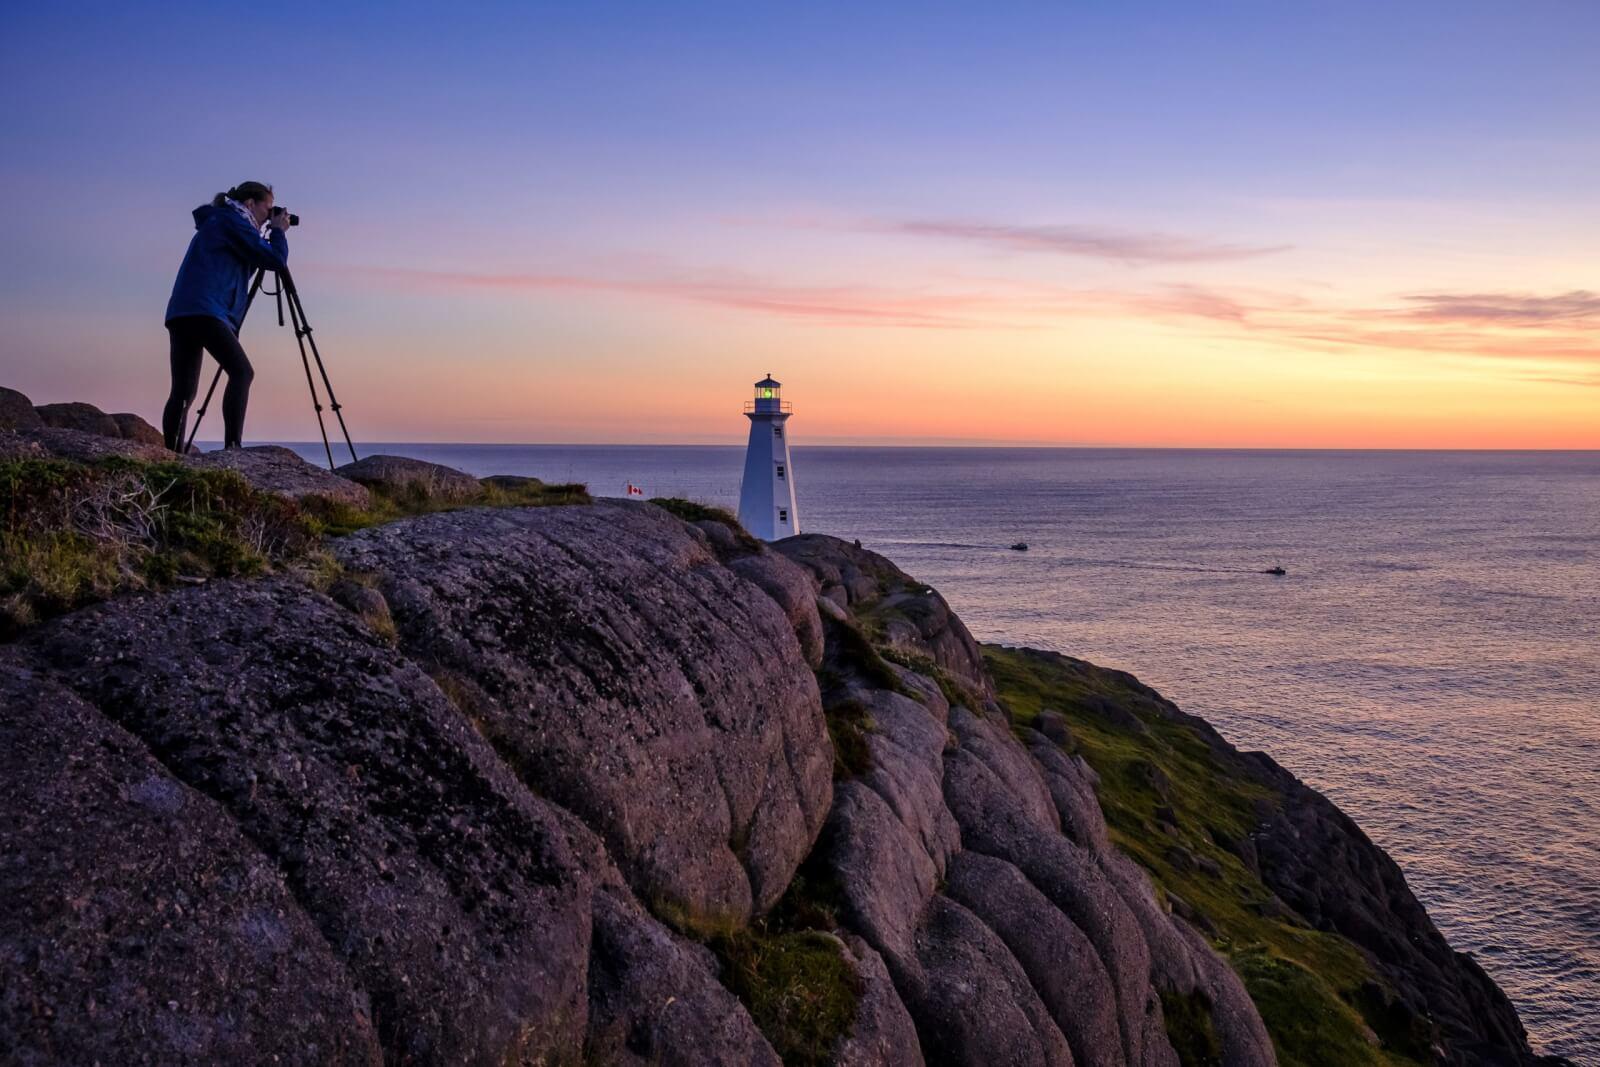 St. John's through the lens - image